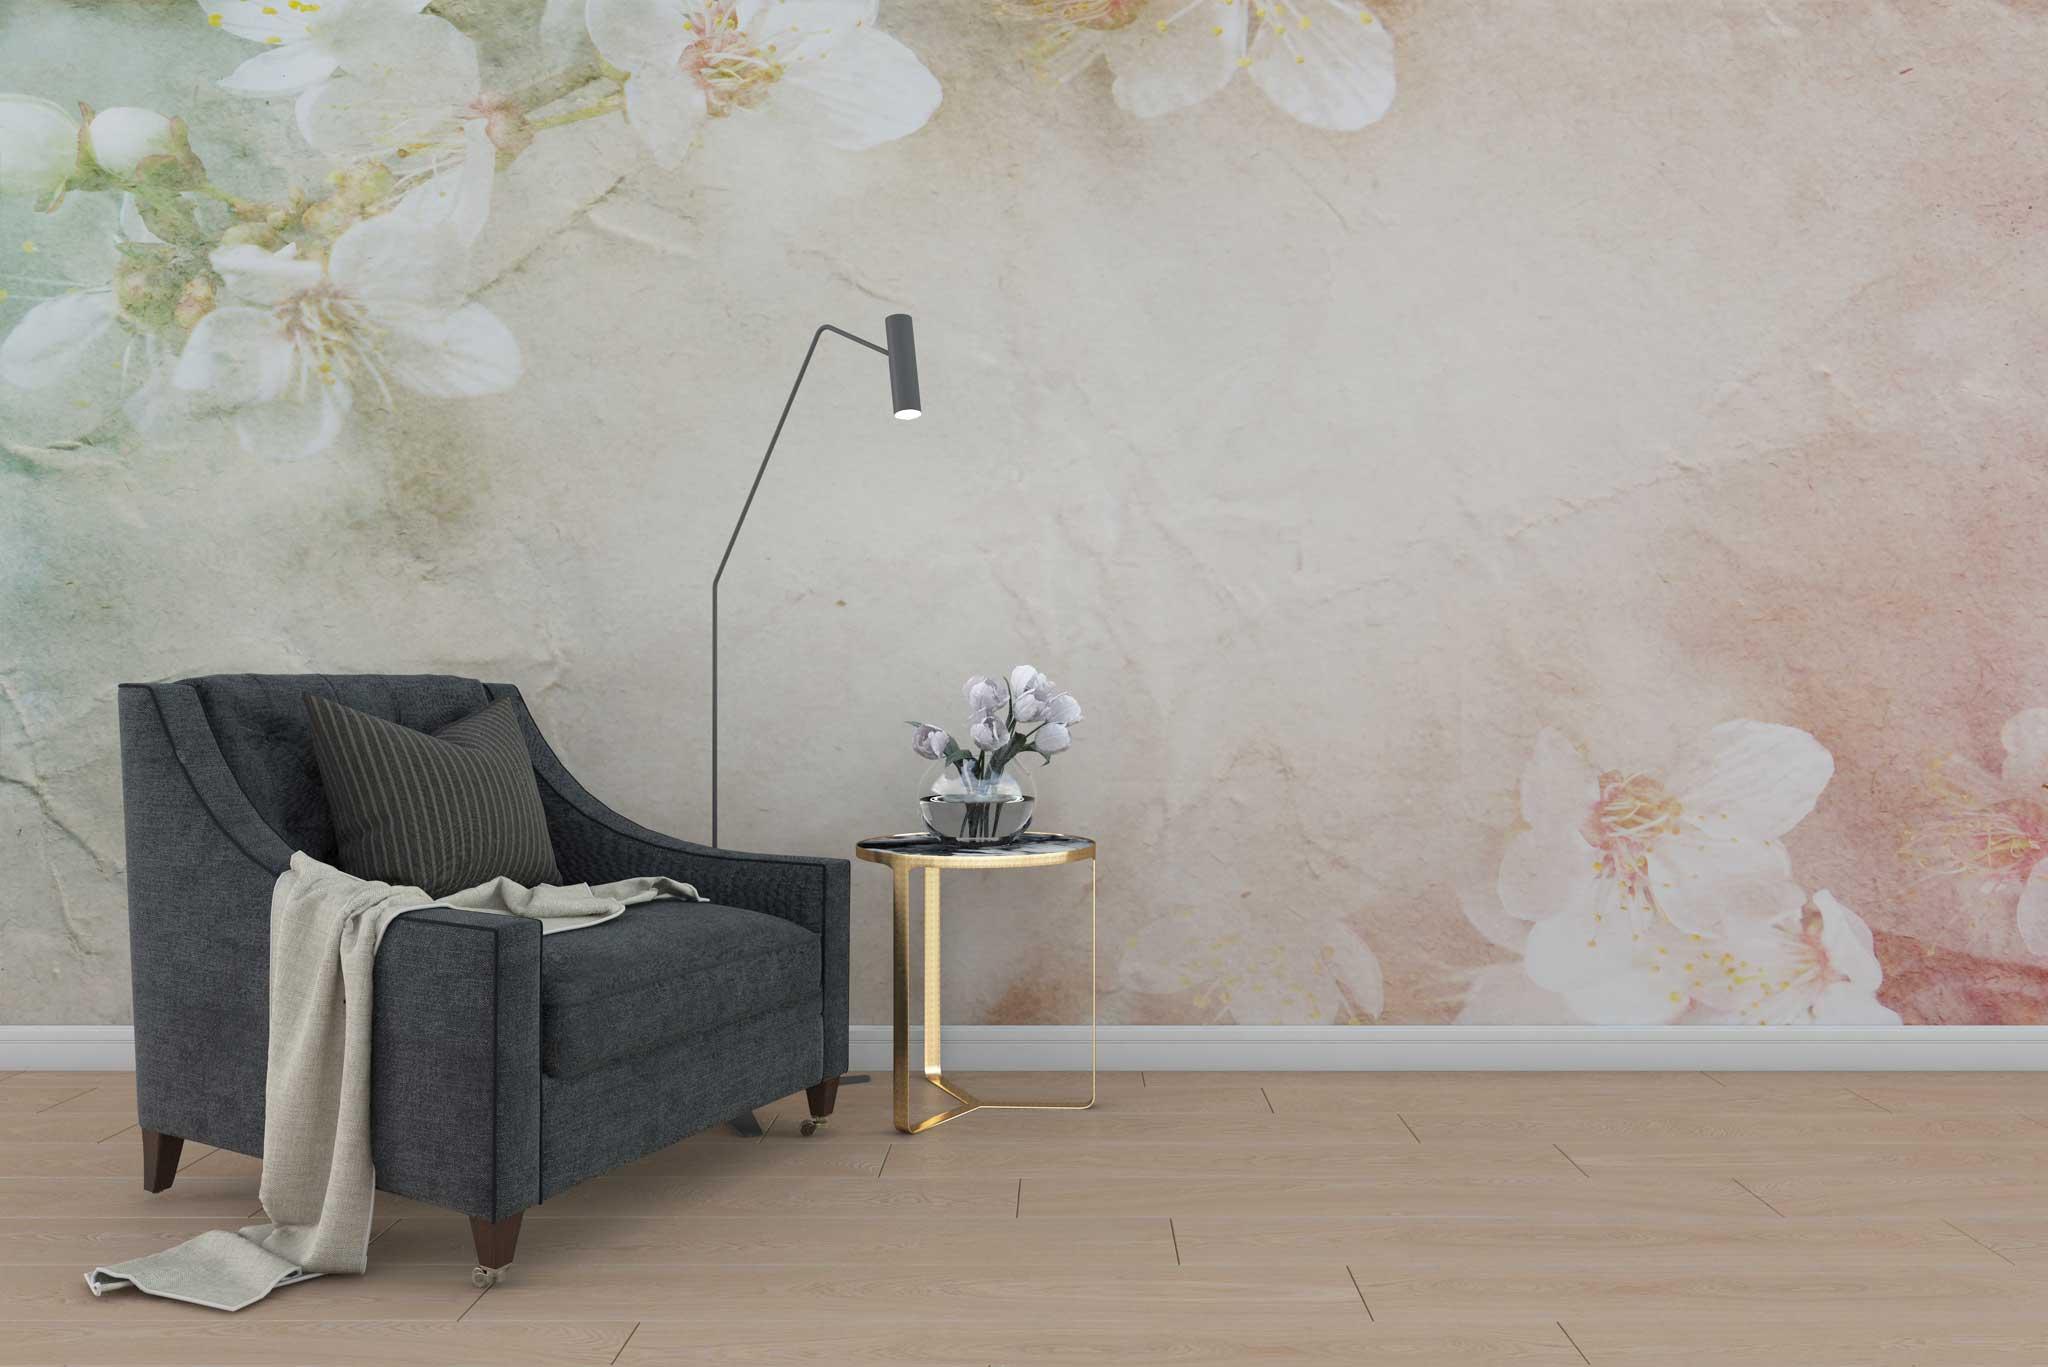 http://daringprints.ro/wp-content/uploads/2020/12/tapet-fototapet-special-personalizat-customizabil-comanda-bucuresti-daring-prints-model-floral-flori-cires-stil-vintage-romantic-pastel.jpg